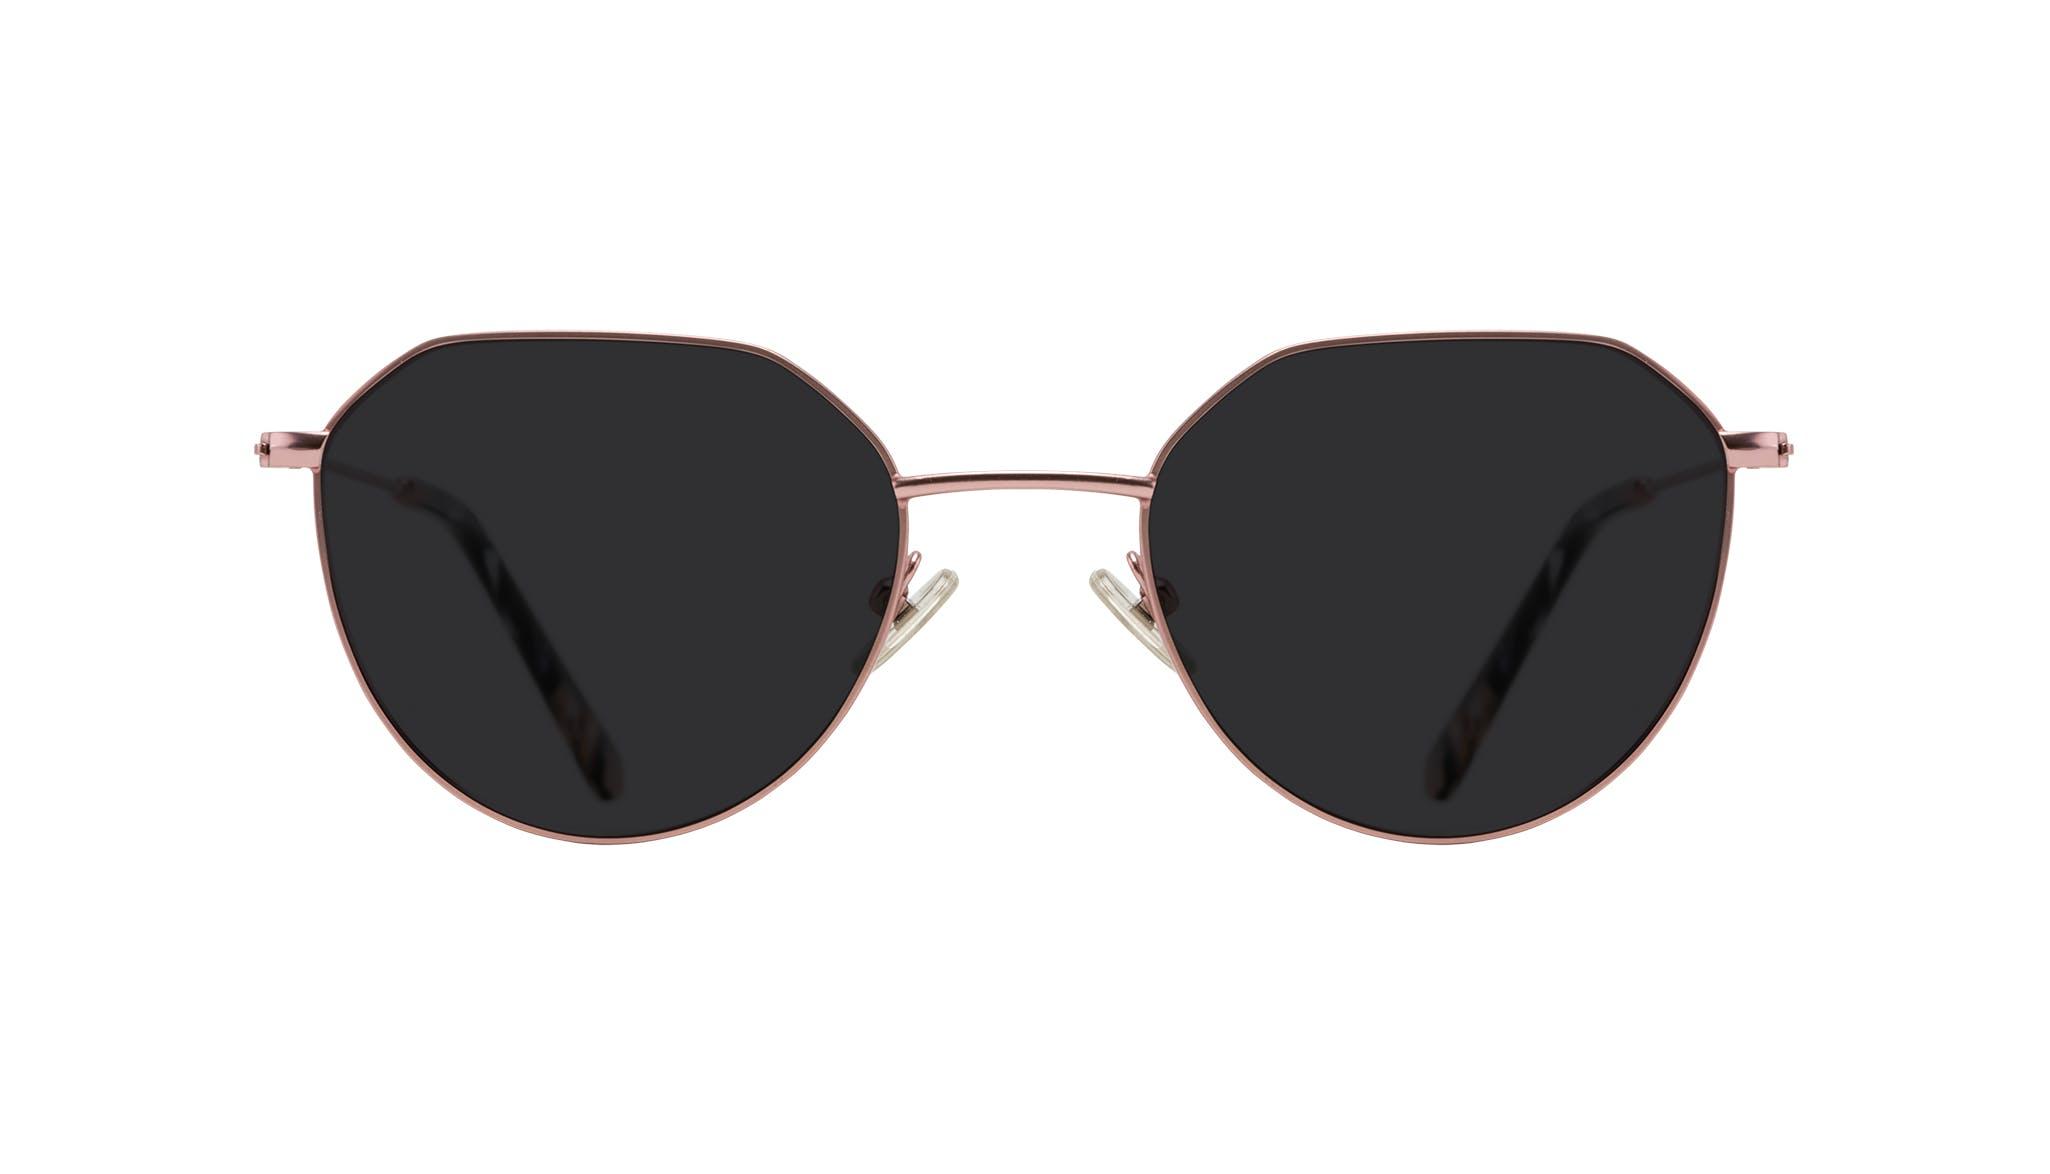 Affordable Fashion Glasses Round Sunglasses Women Prism Blush